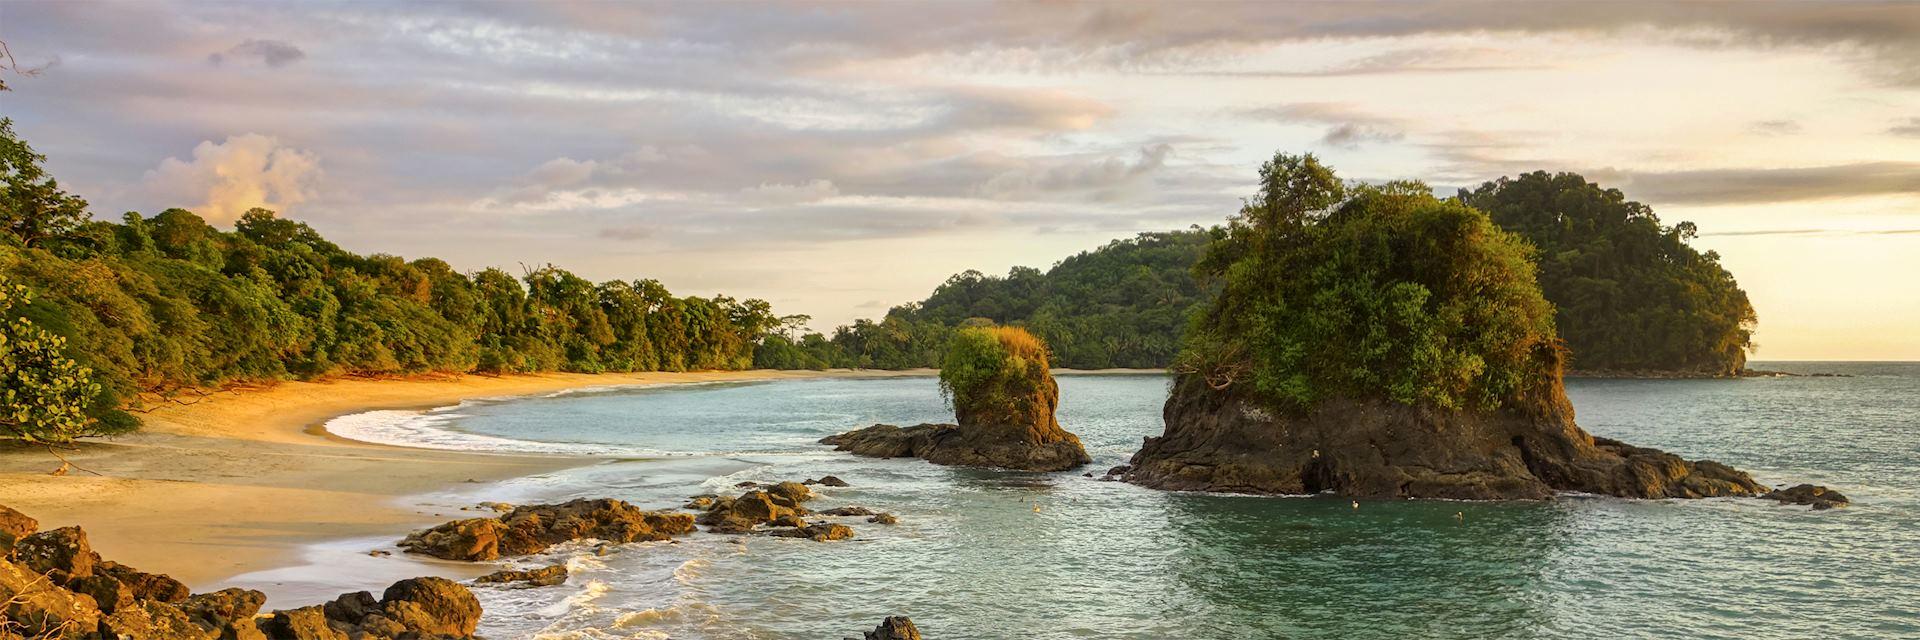 Manuel Antonio National Park coastline